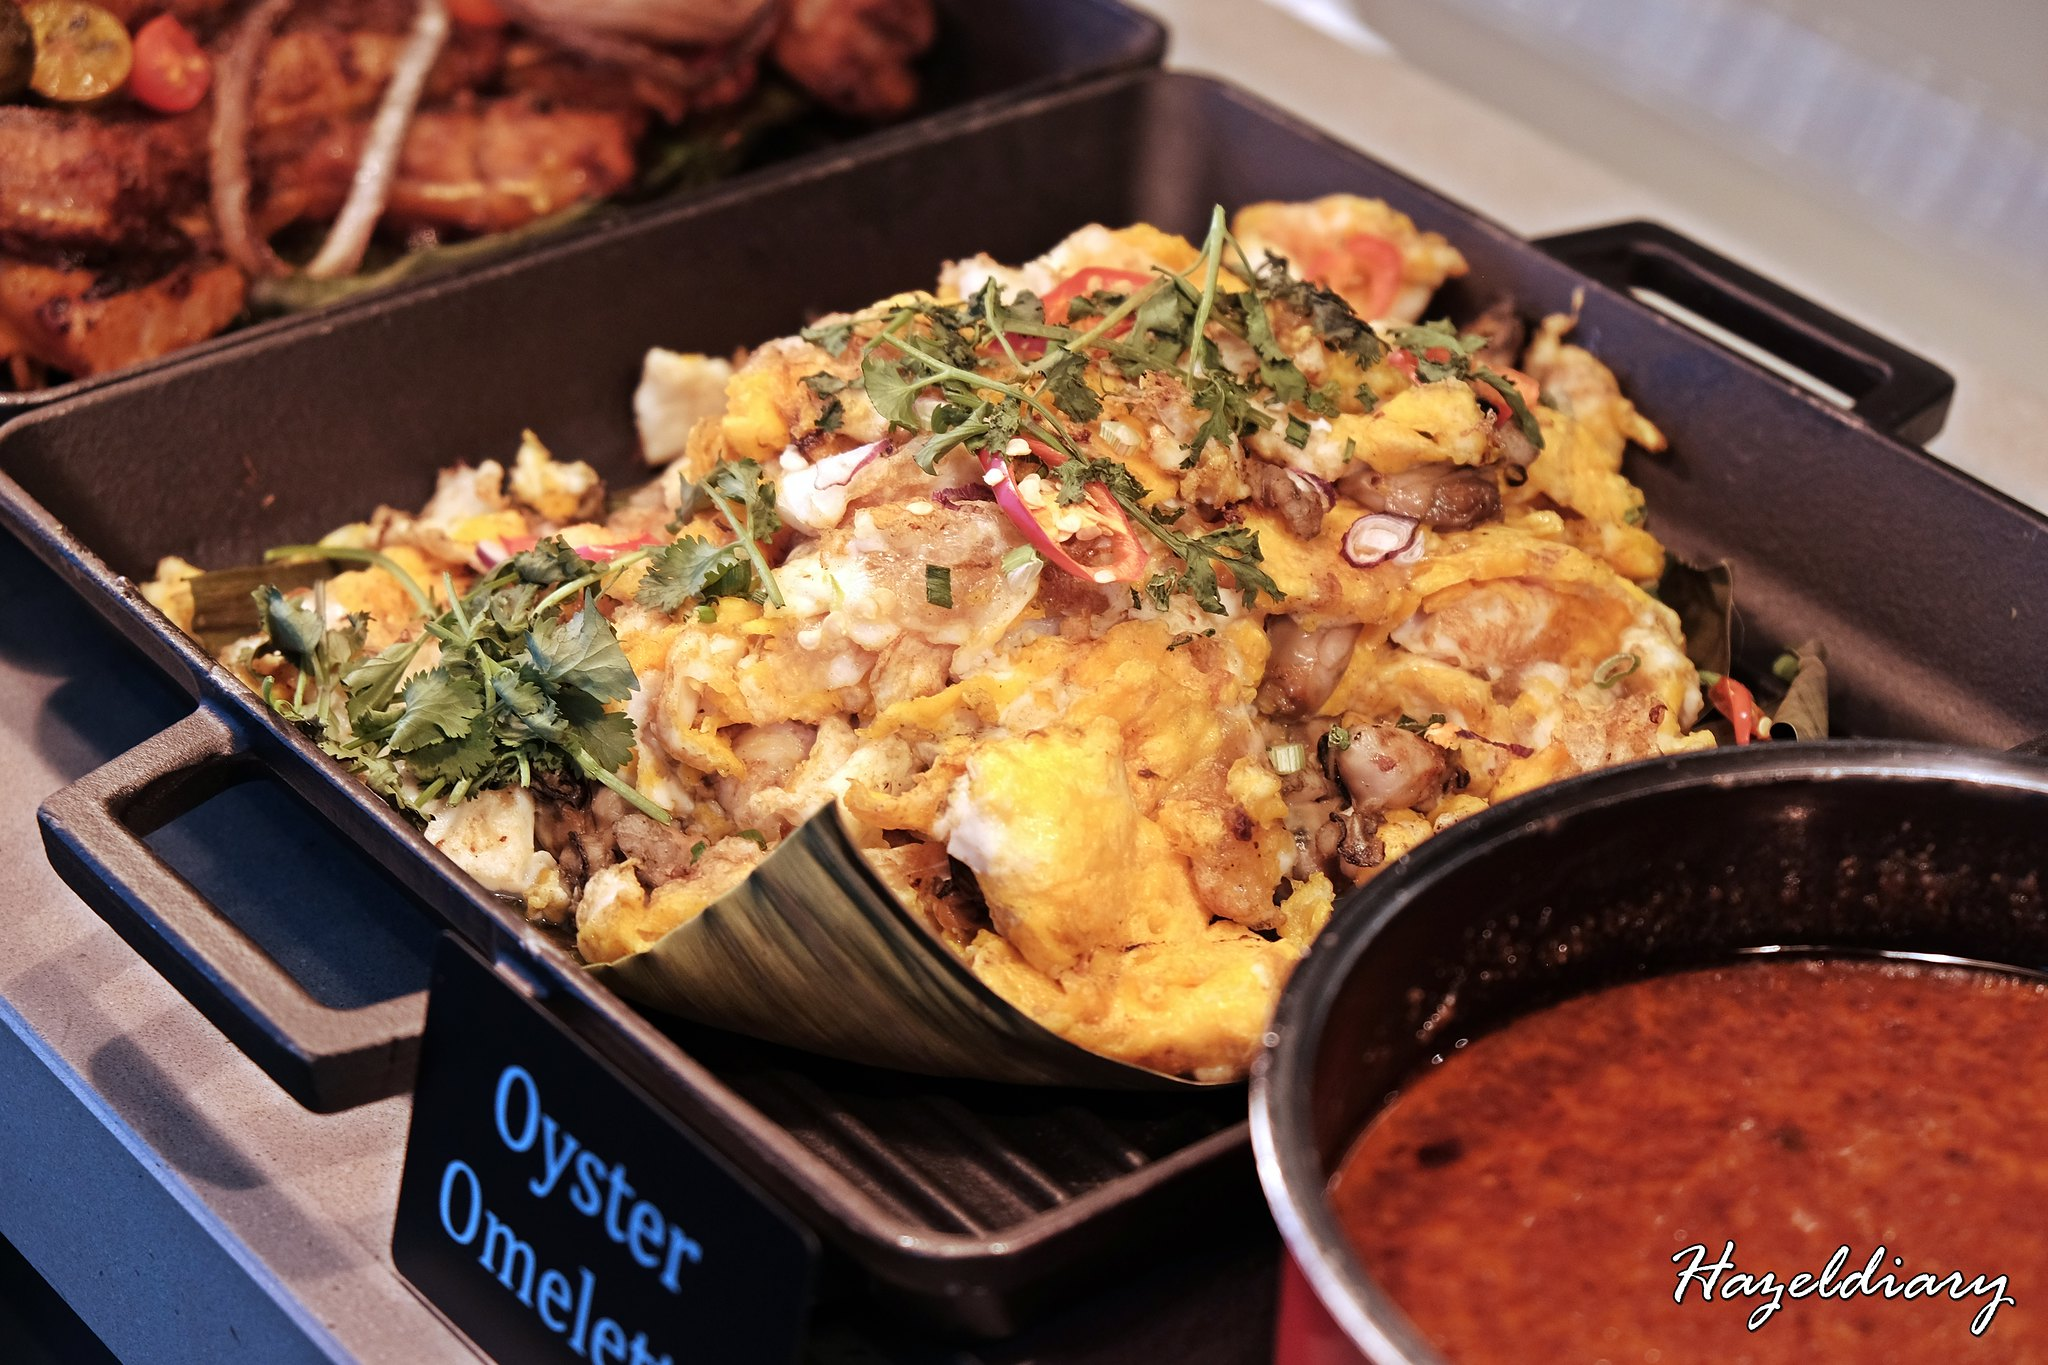 Penang Food Fare Buffet-Sky22 Courtyard Marriott-Oyster Omelette-1